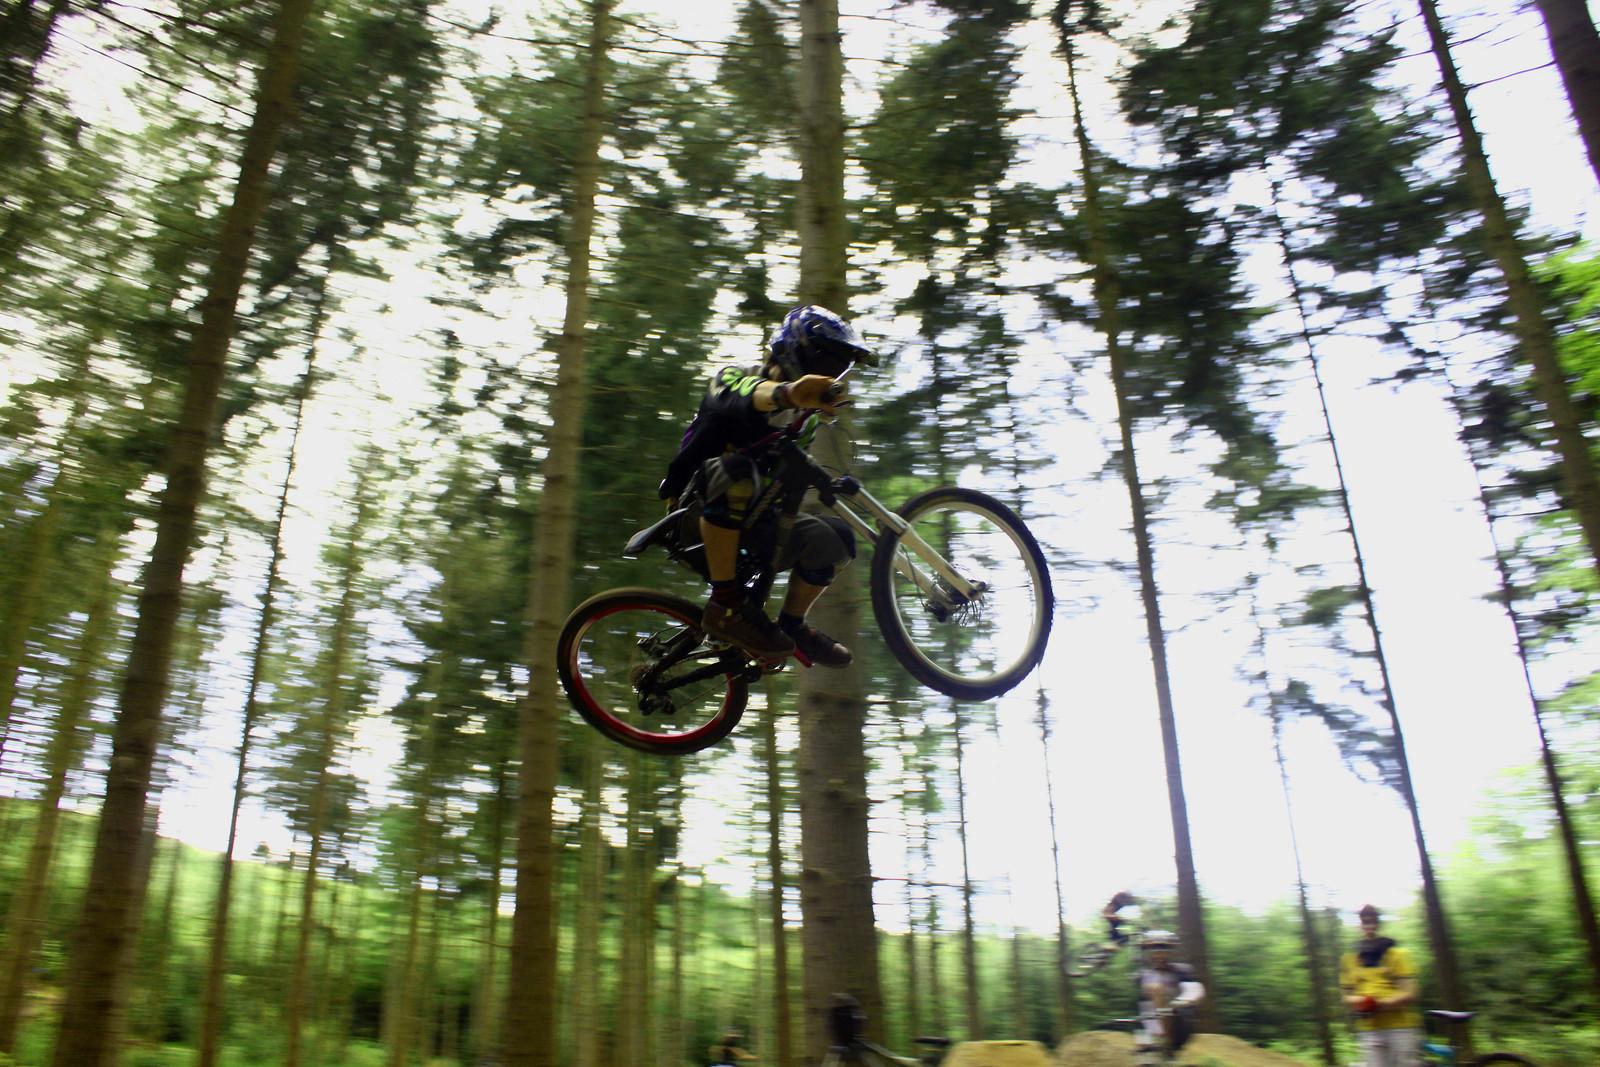 Paddy Dukes - bikematter - Mountain Biking Pictures - Vital MTB